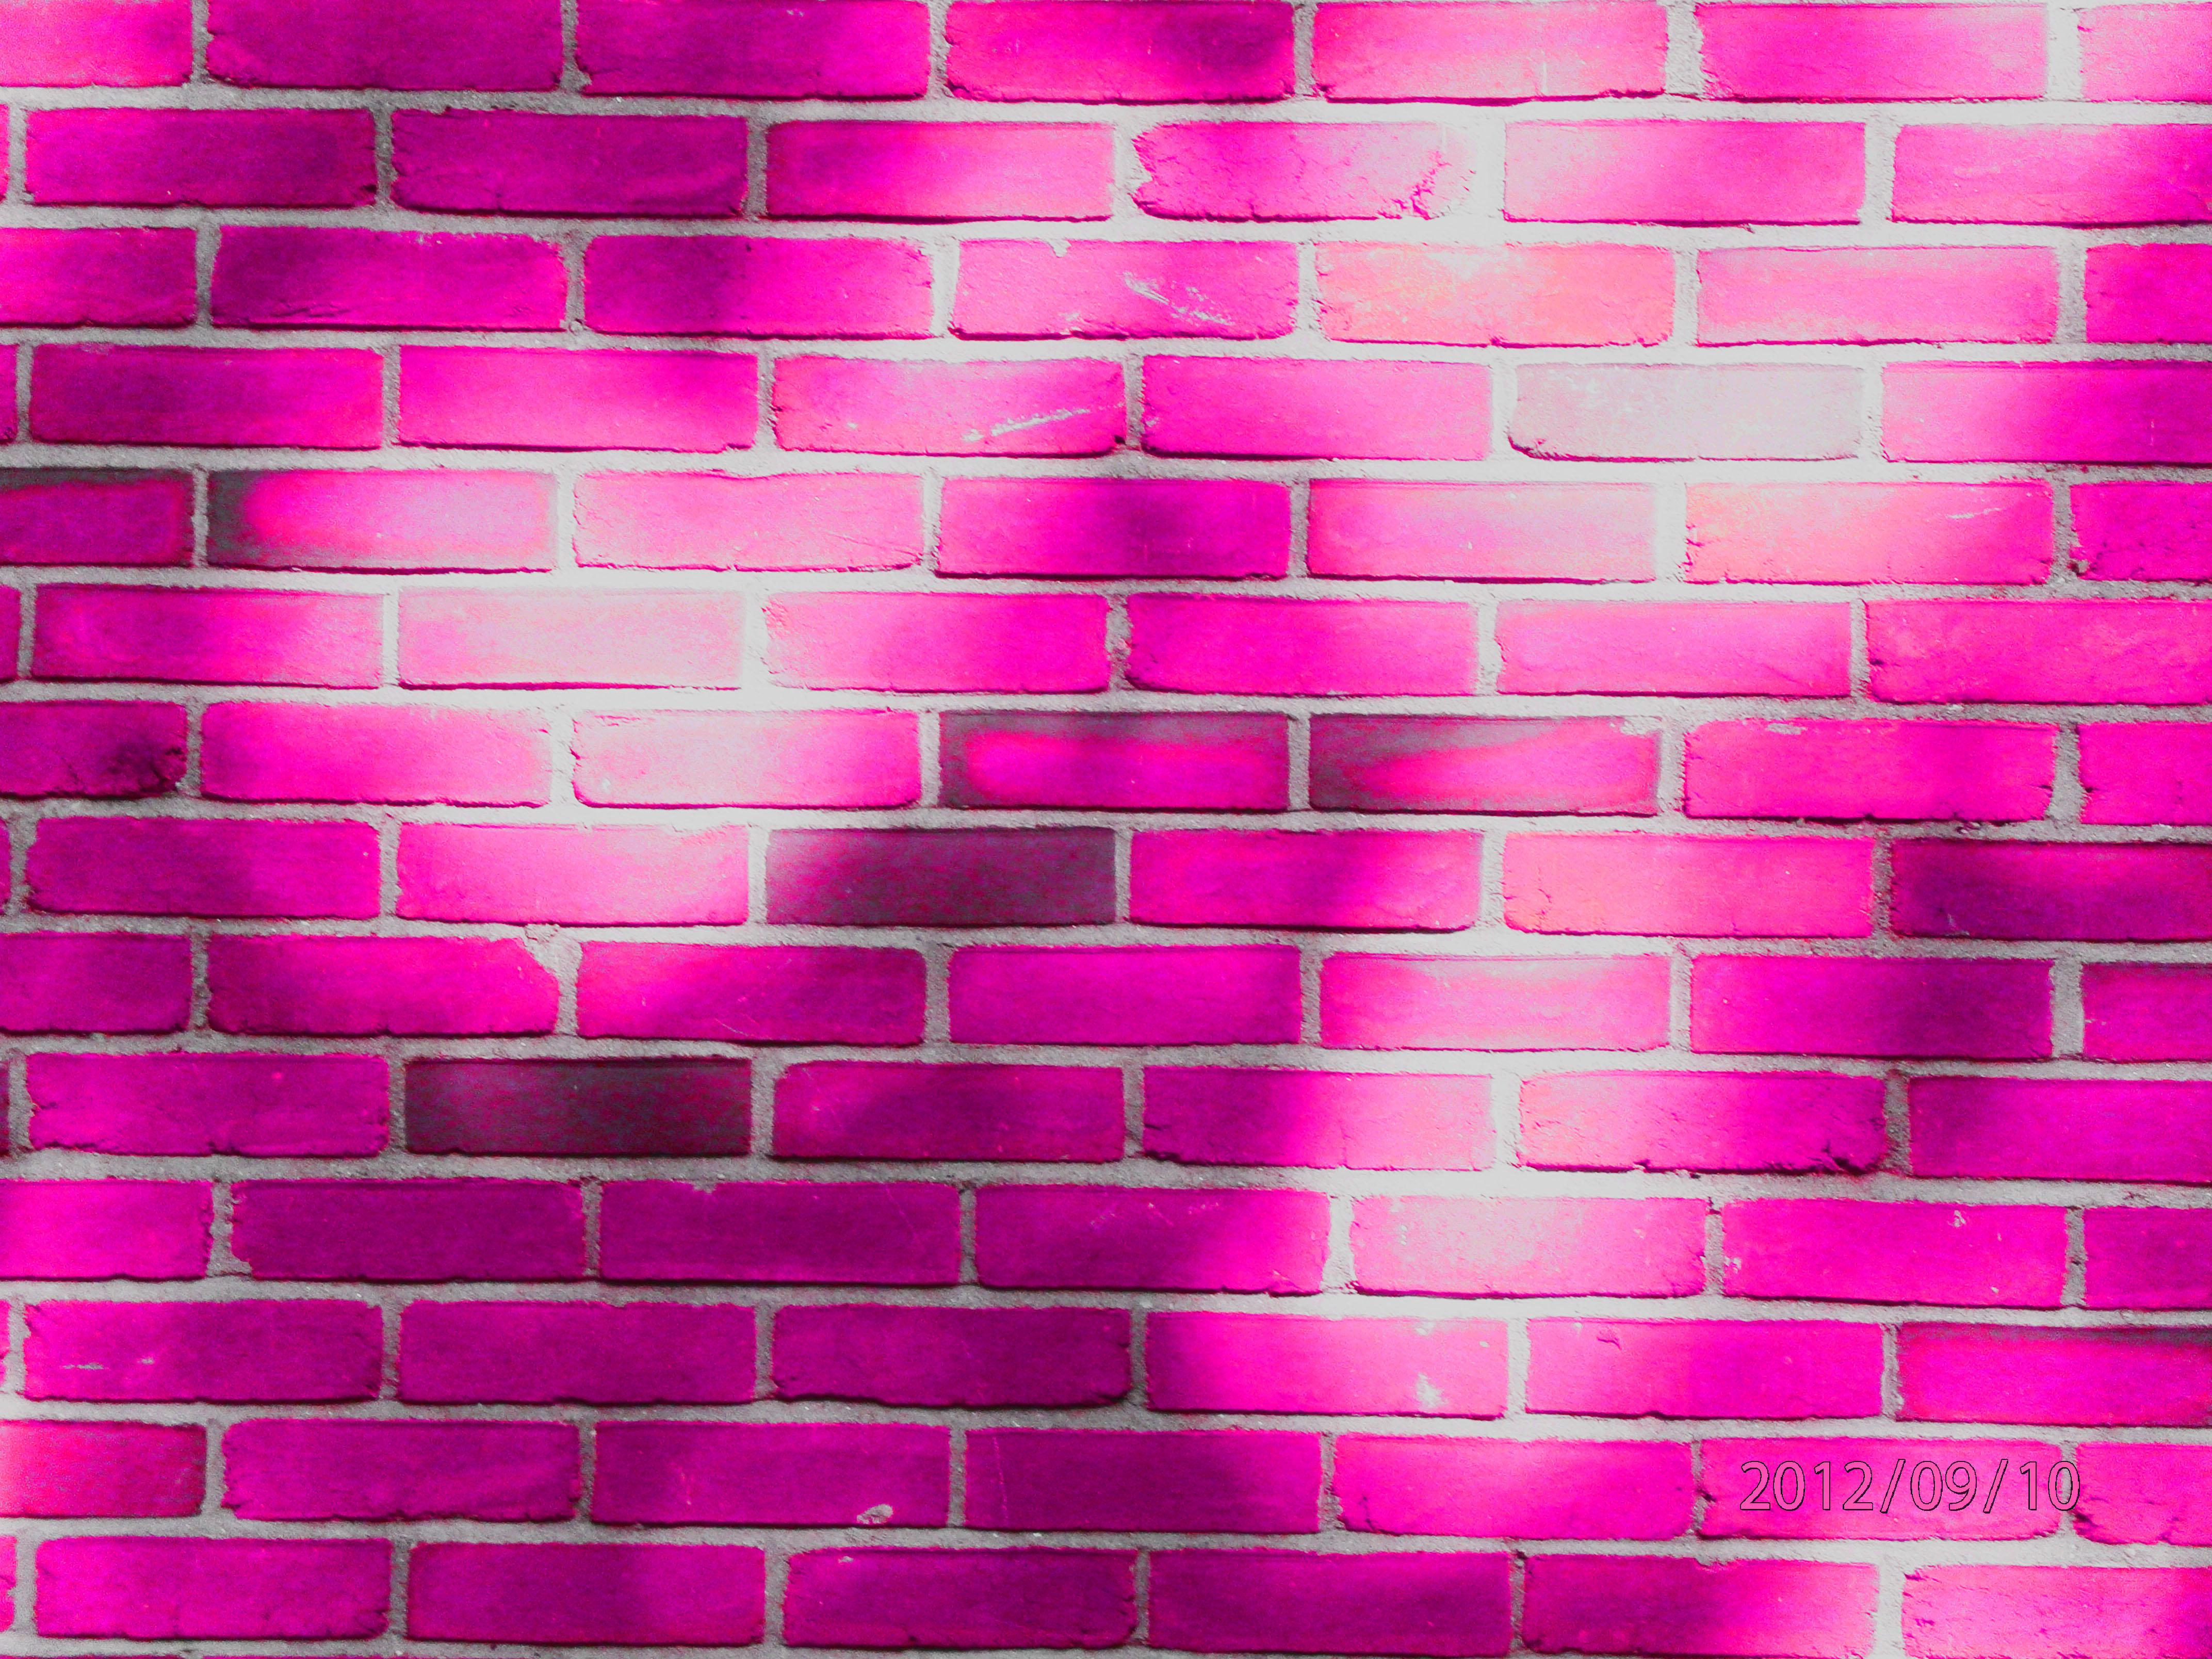 pink brick wall wchryslerphoto